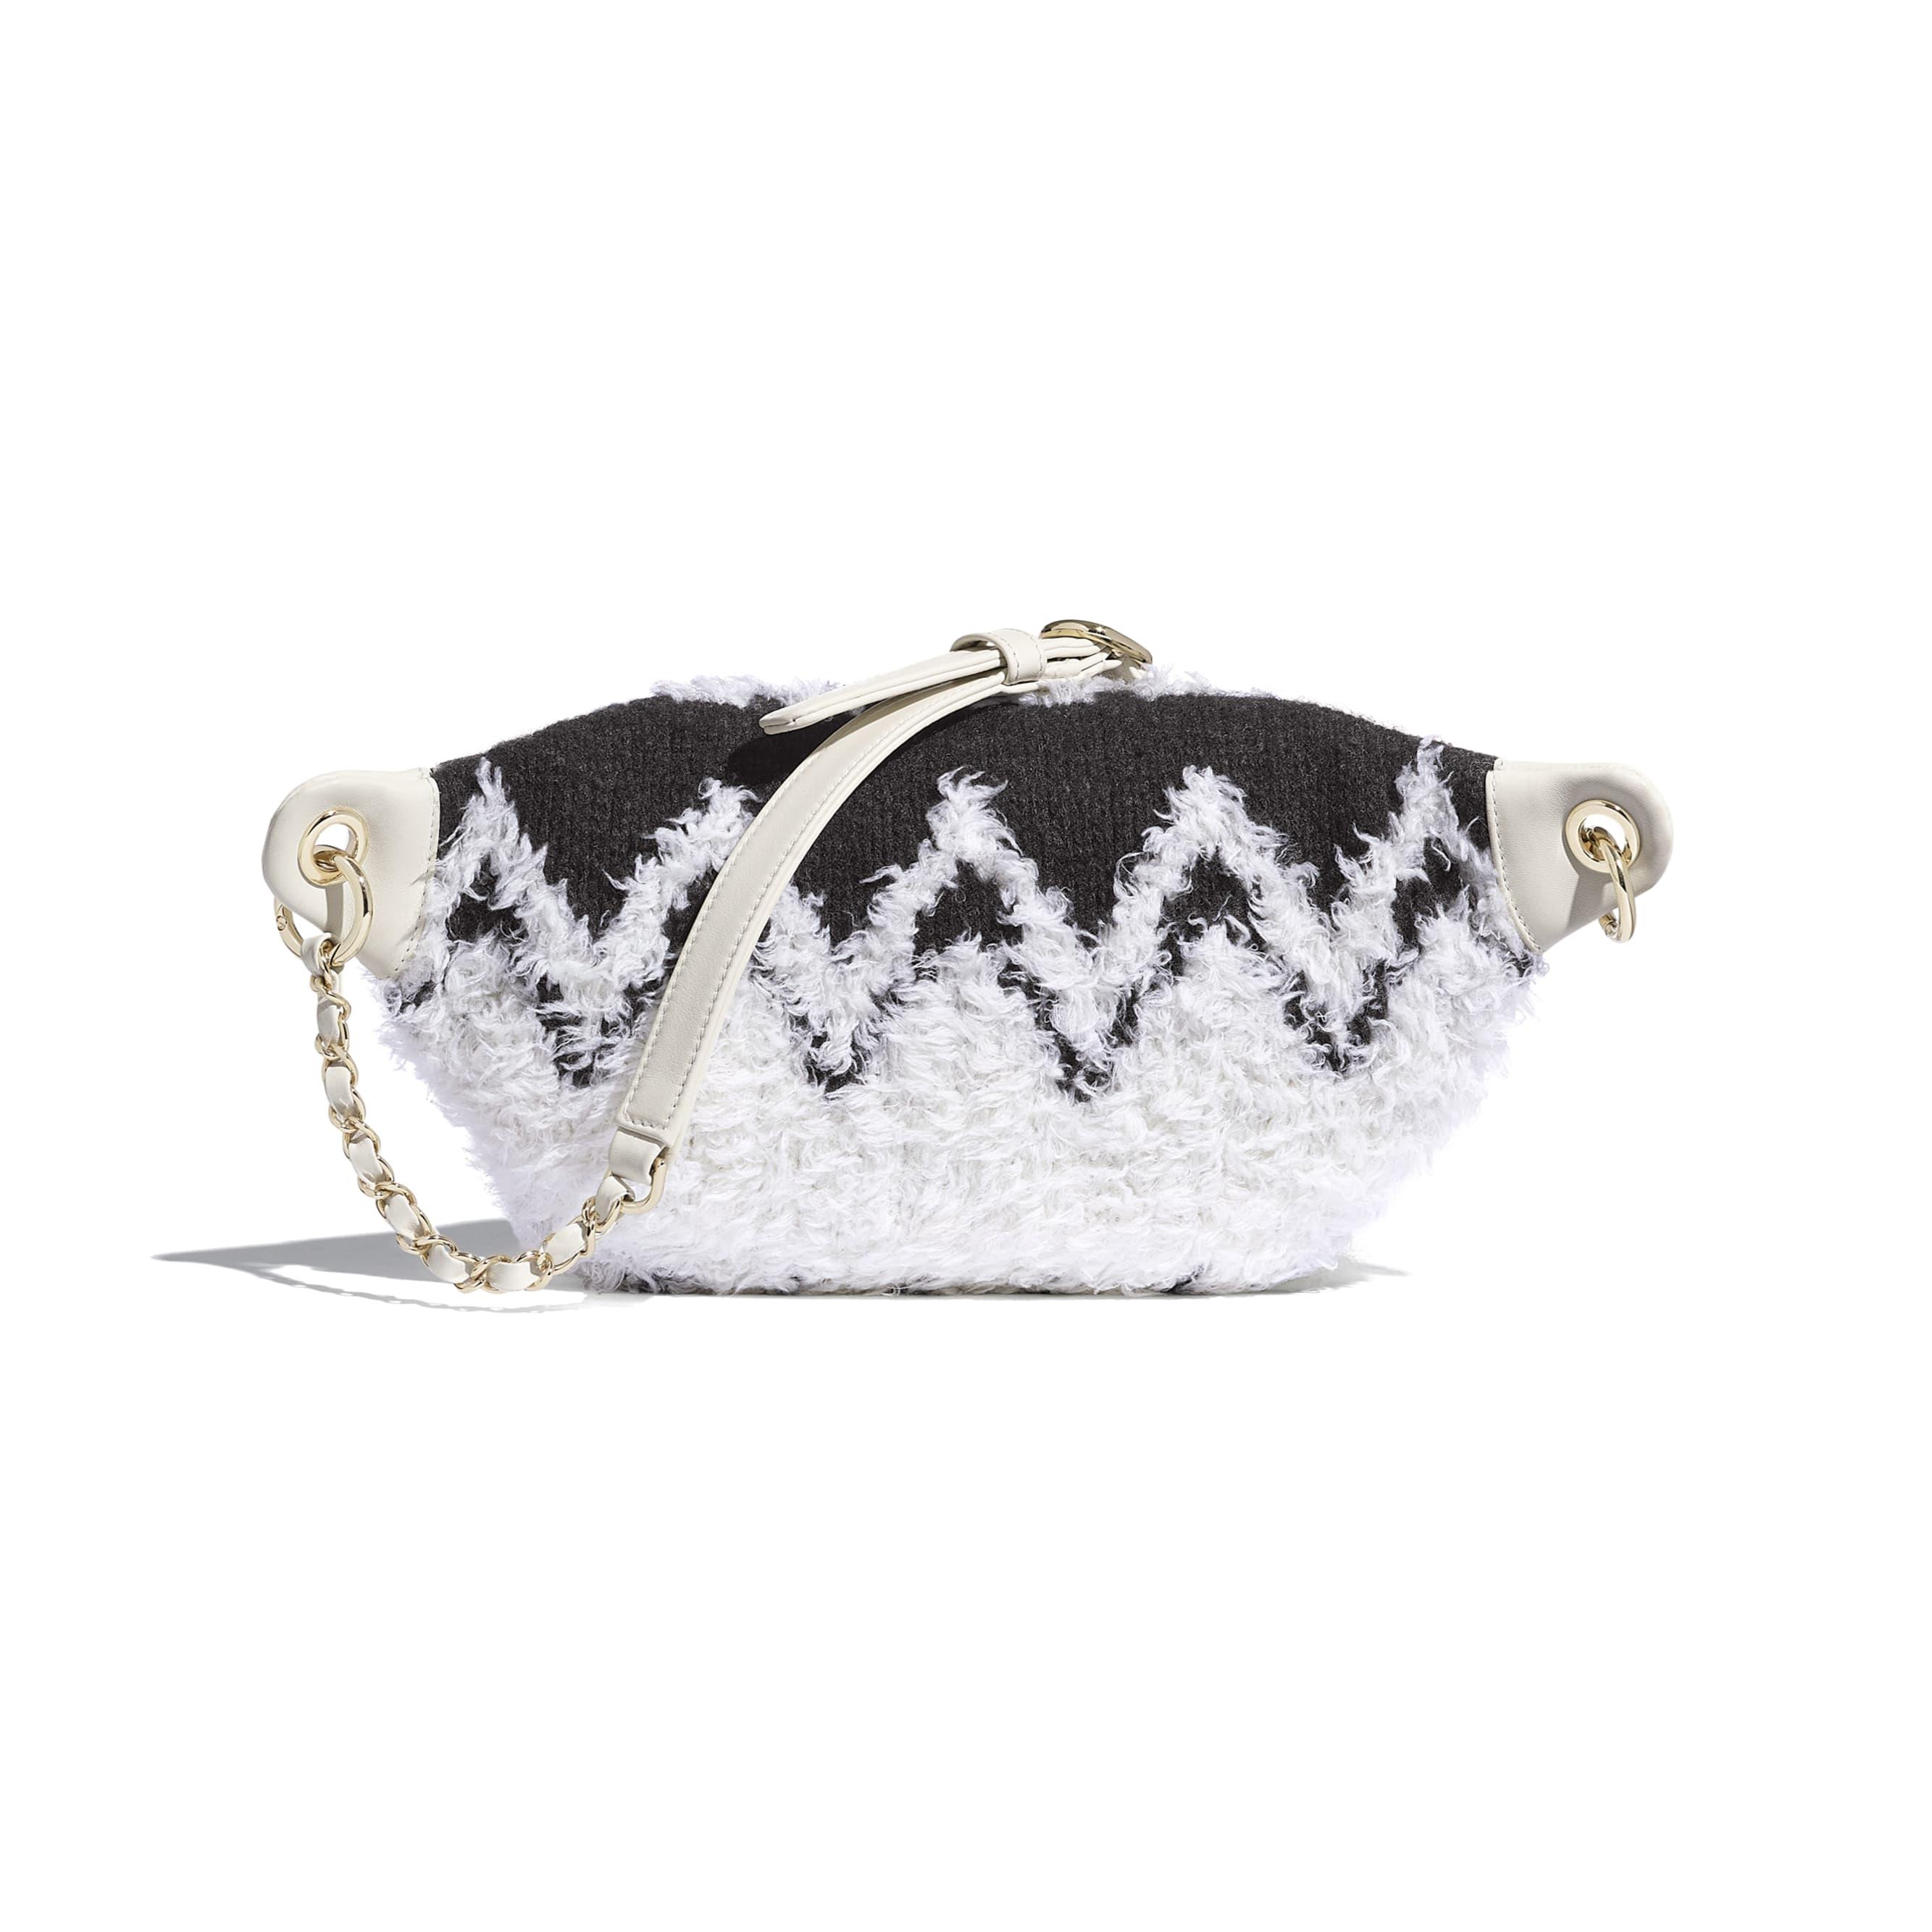 Waist Bag - White & Black - Wool, Shearling Sheepskin & Gold-Tone Metal - Alternative view - see standard sized version